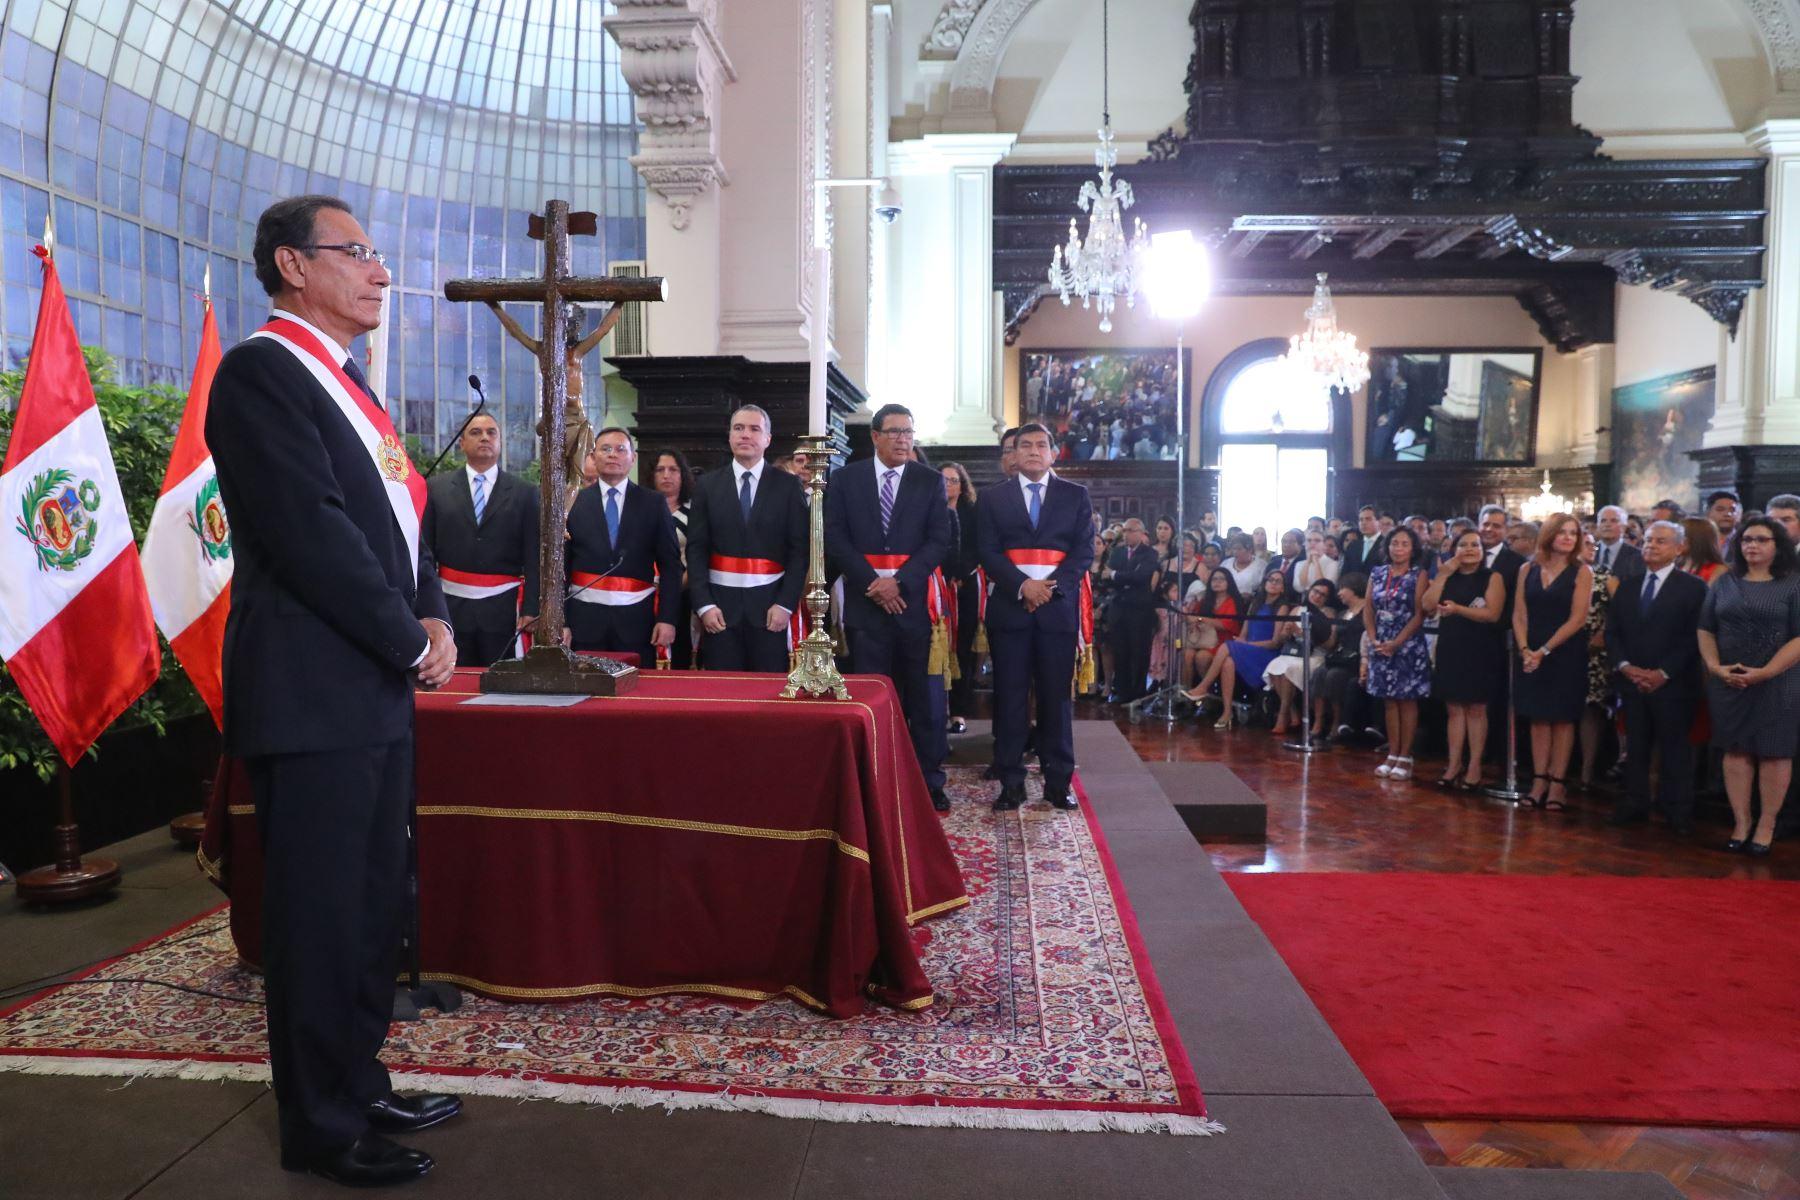 Presidente Martín Vizcarra juramenta al nuevo gabinete ministerial. Foto: ANDINA/Prensa Presidencia